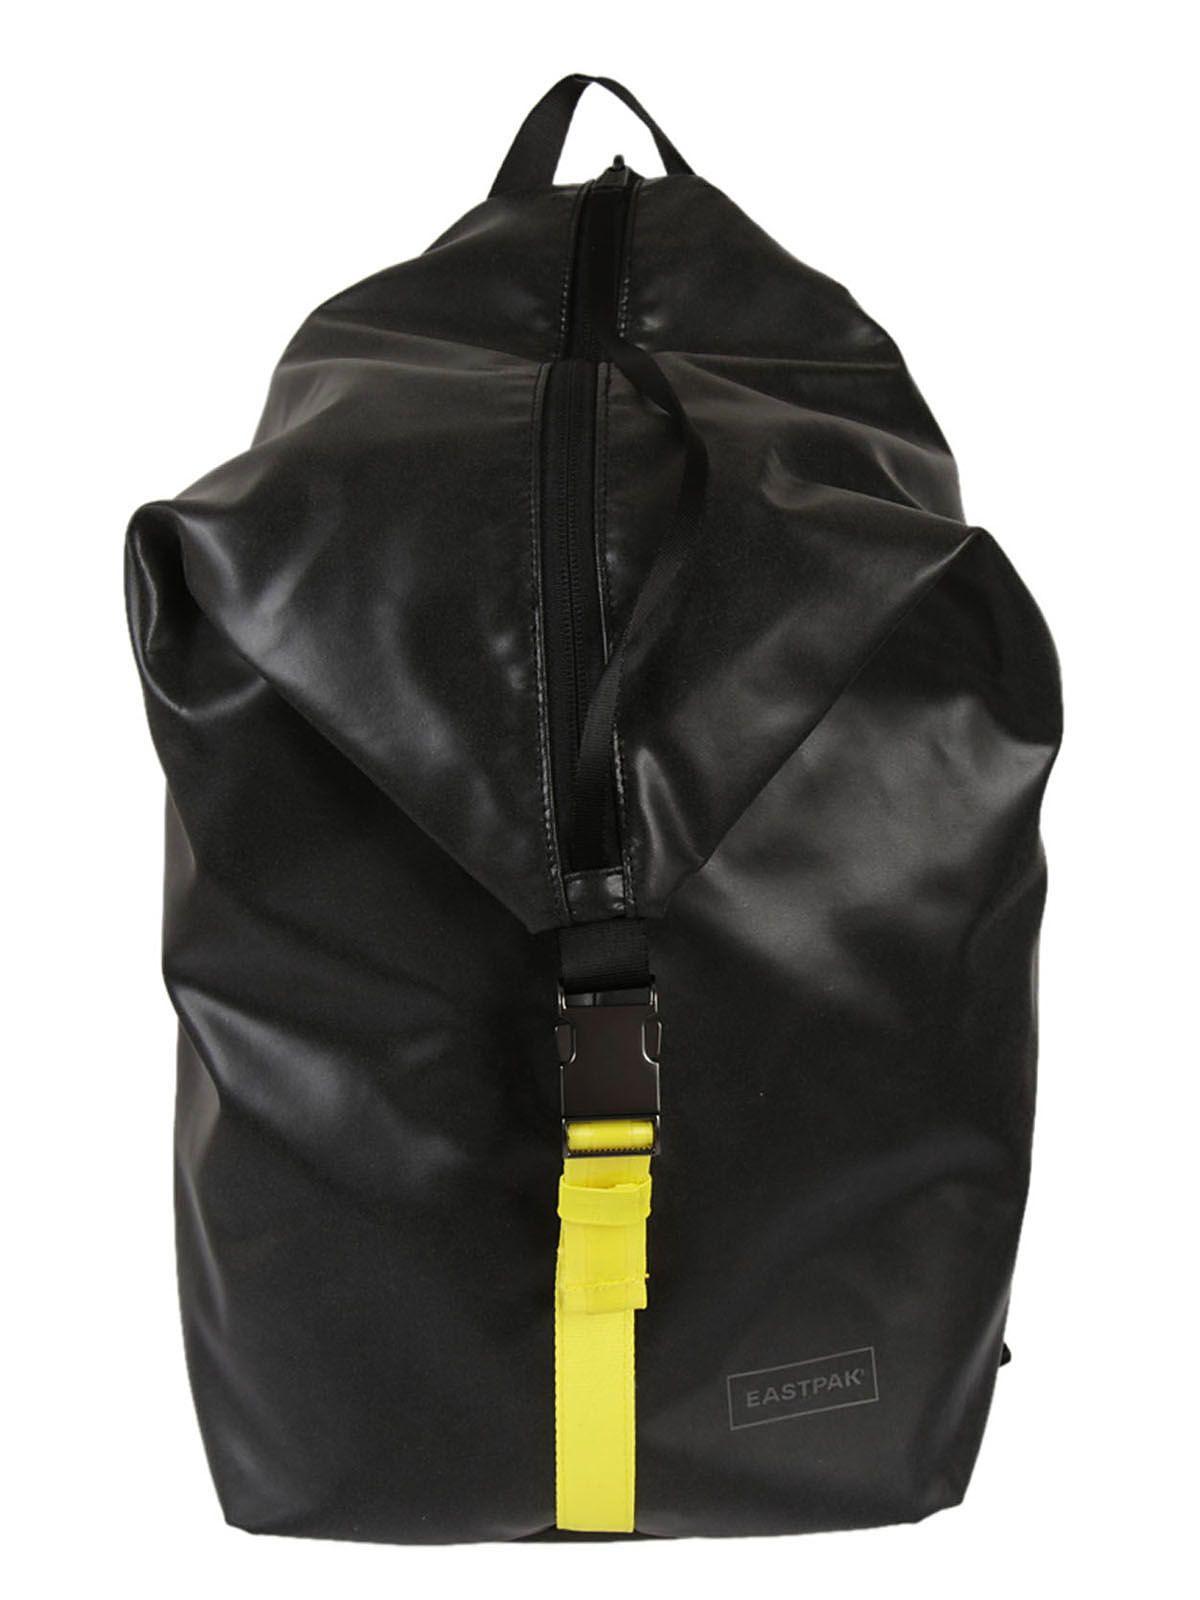 Eastpak Contrast Zipped Backpack